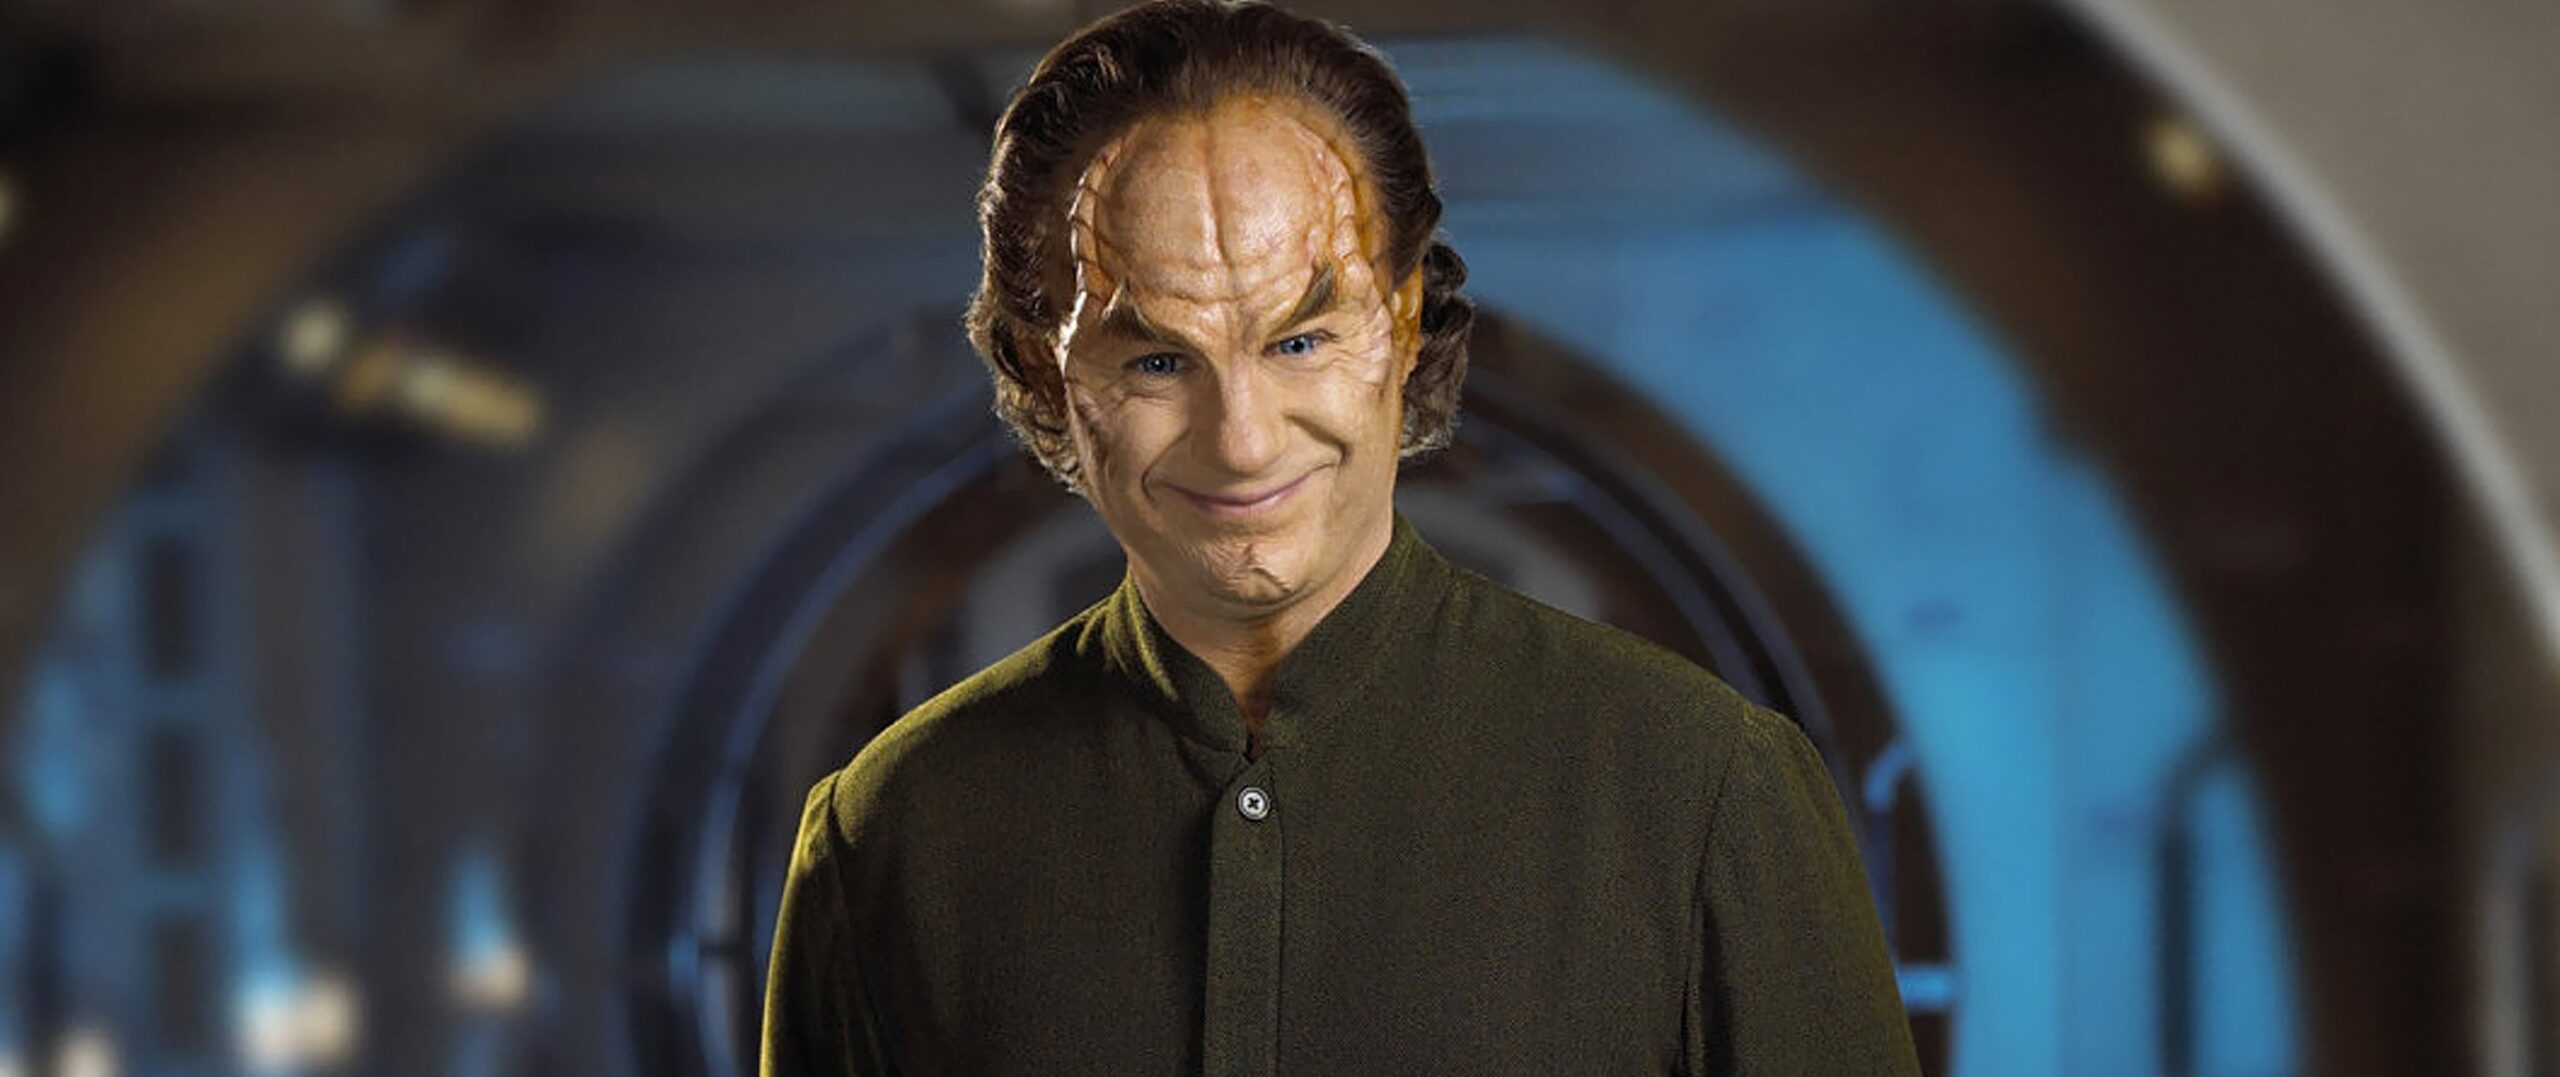 John Billingsley Claims Phlox Was Star Trek's First Gay Character